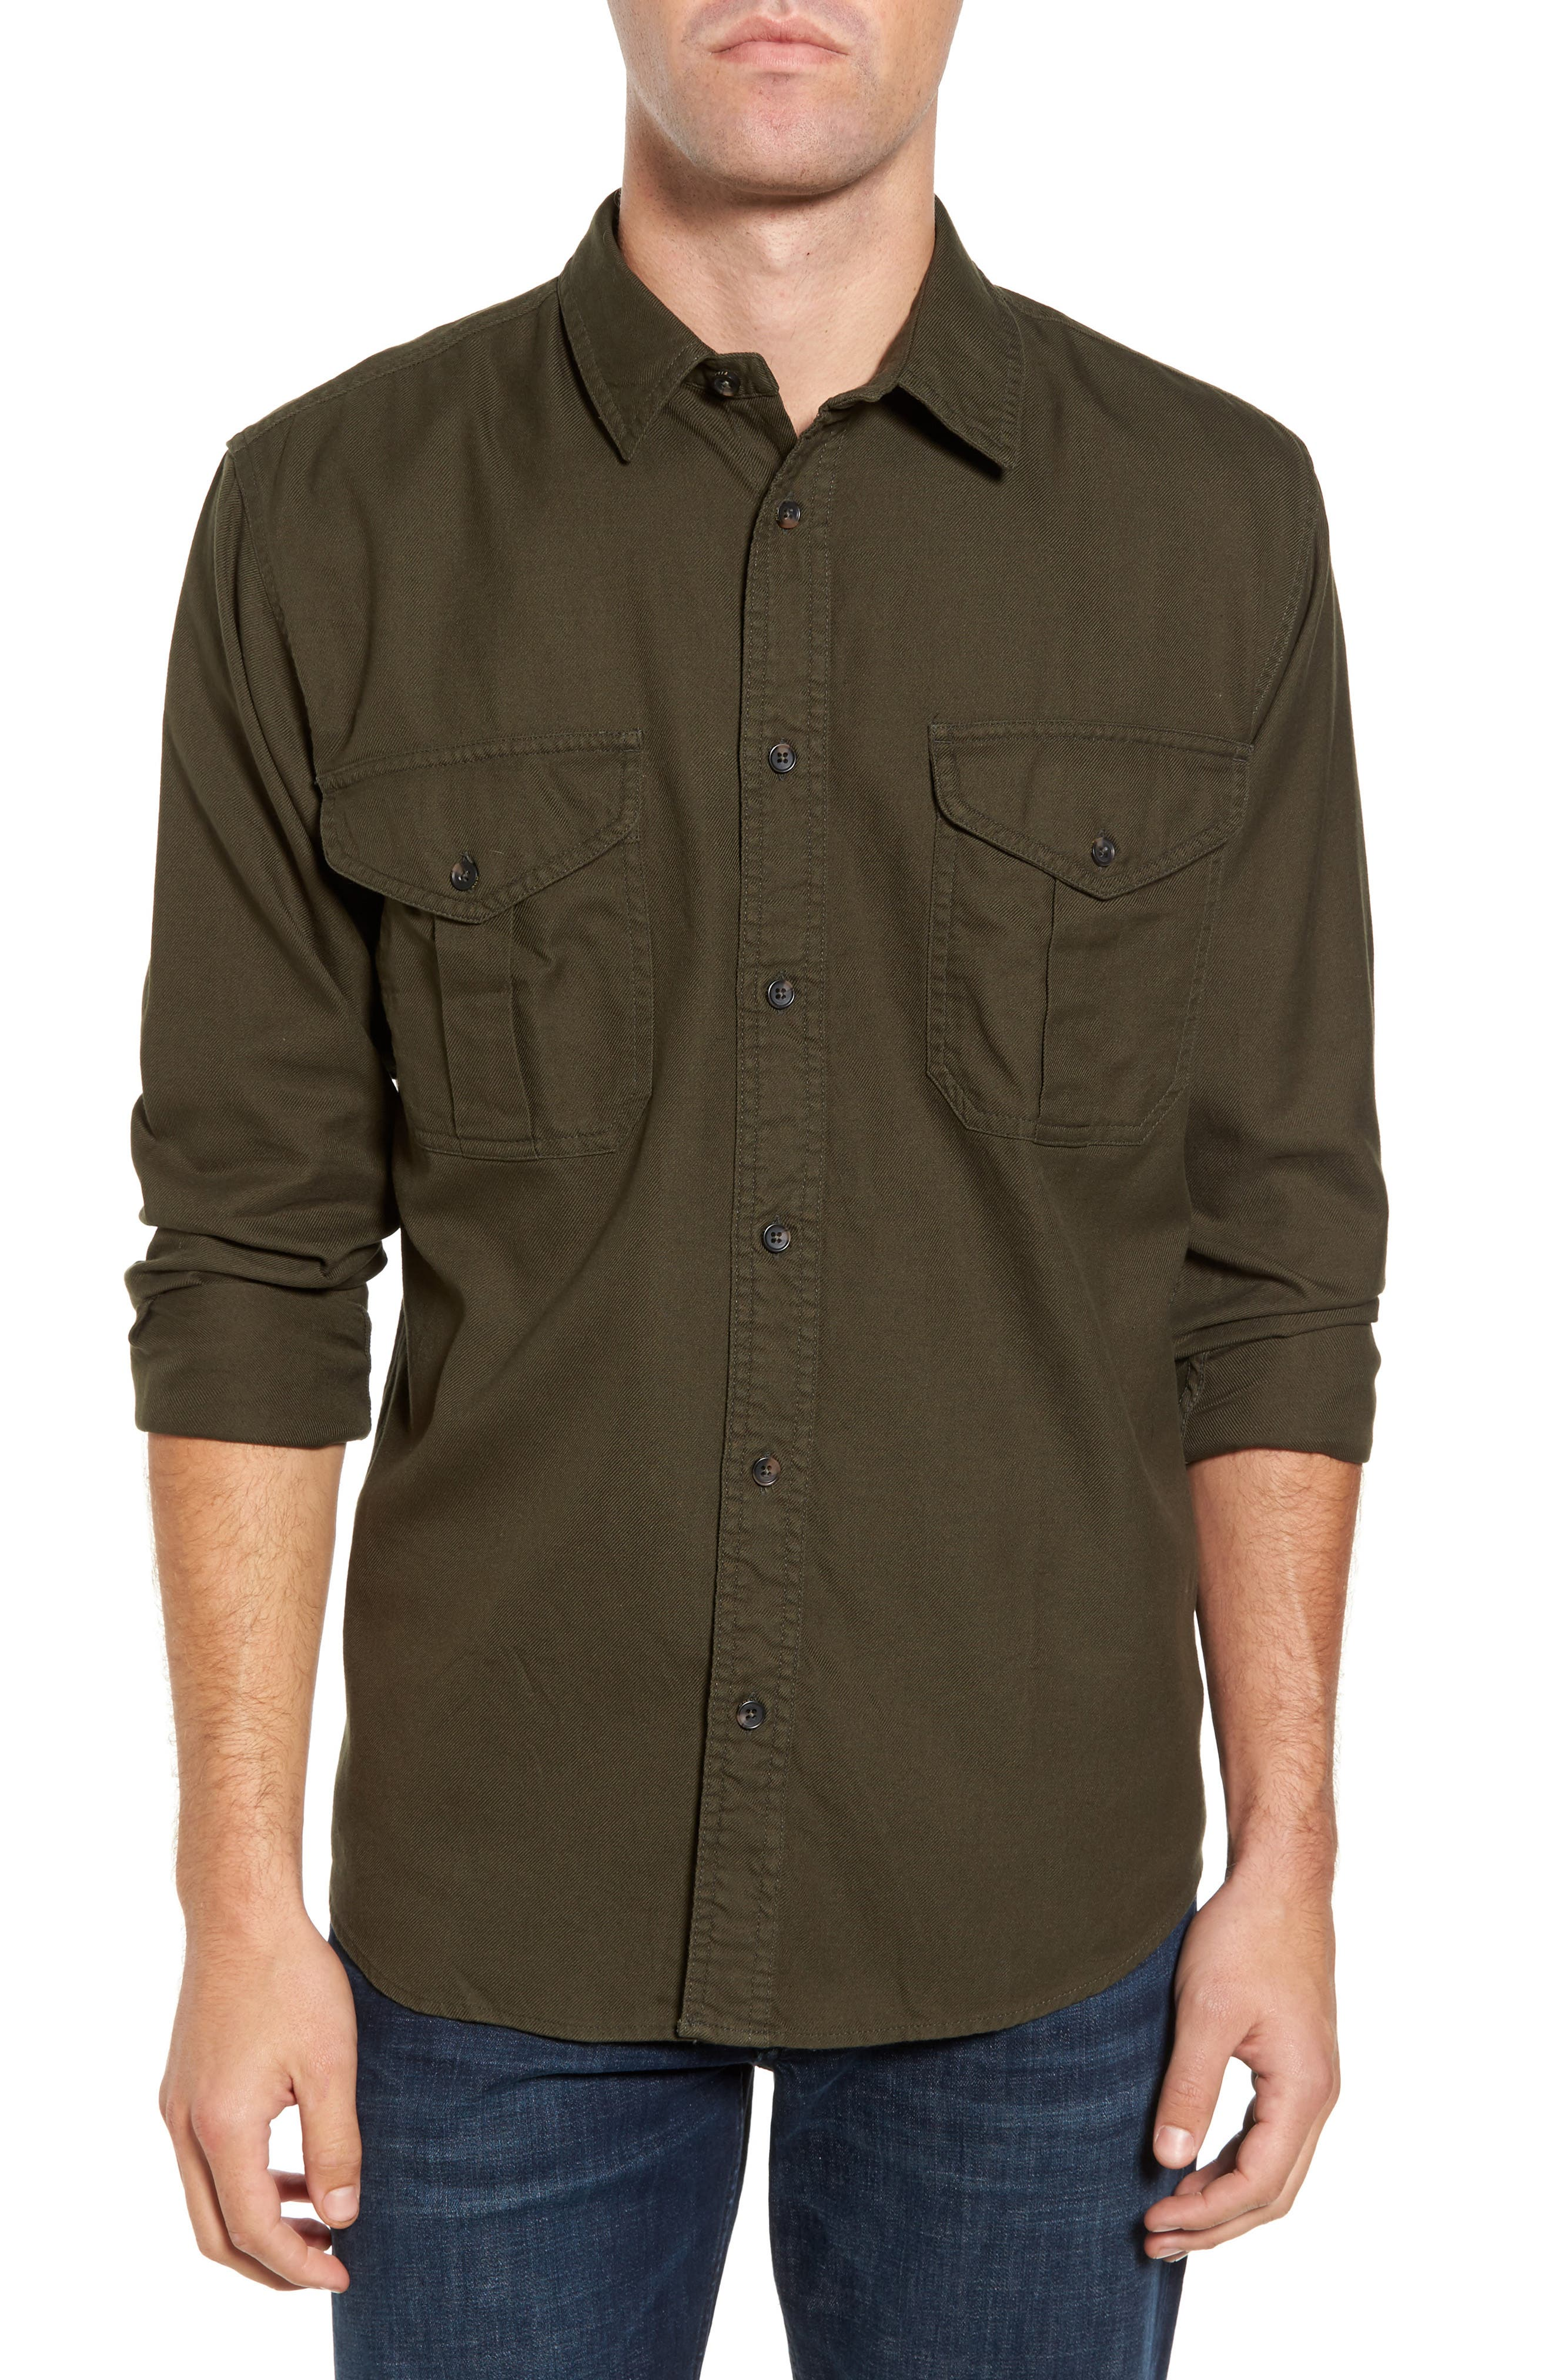 Main Image - Filson Alaskan Guide Regular Fit Twill Shirt